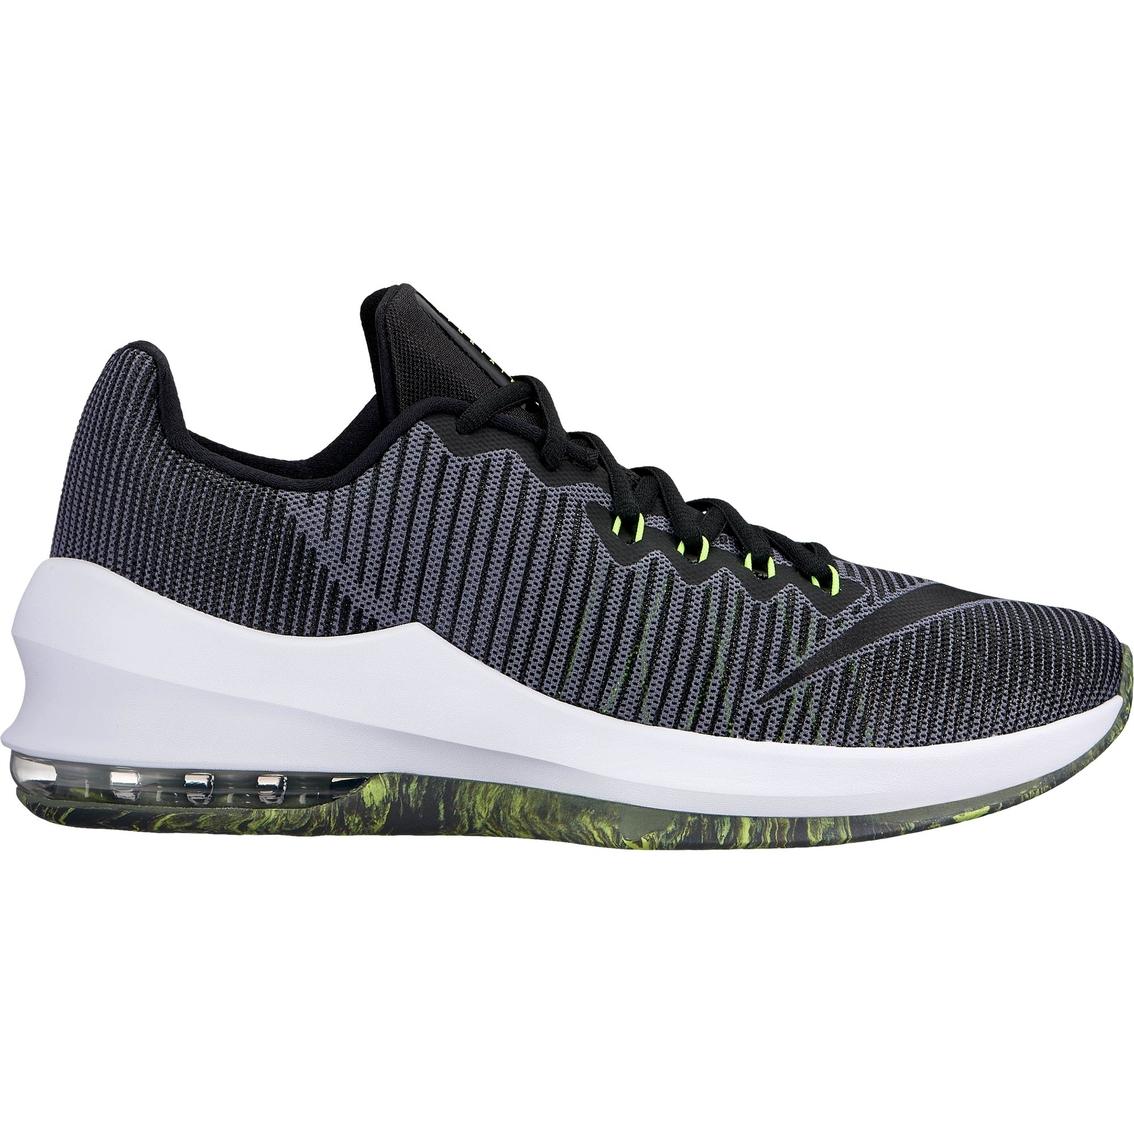 02b1790f498c Nike Men s Air Max Infuriate 2 Low Basketball Shoes